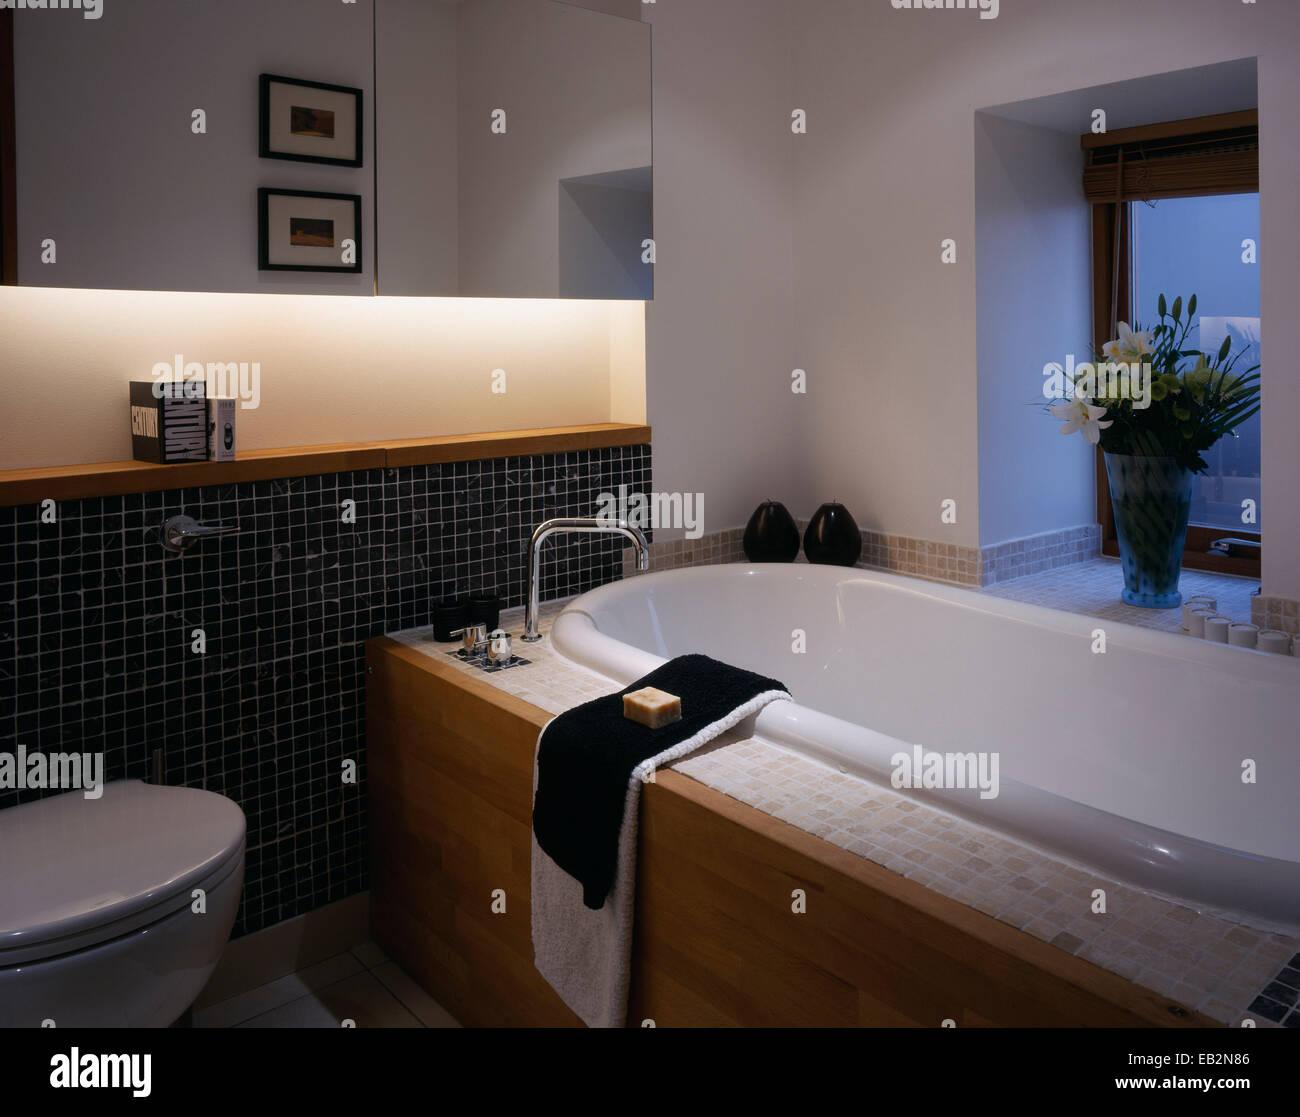 Bathtub in modern bathroom in The Grainstore, Perthshire, Scotland - Stock Image